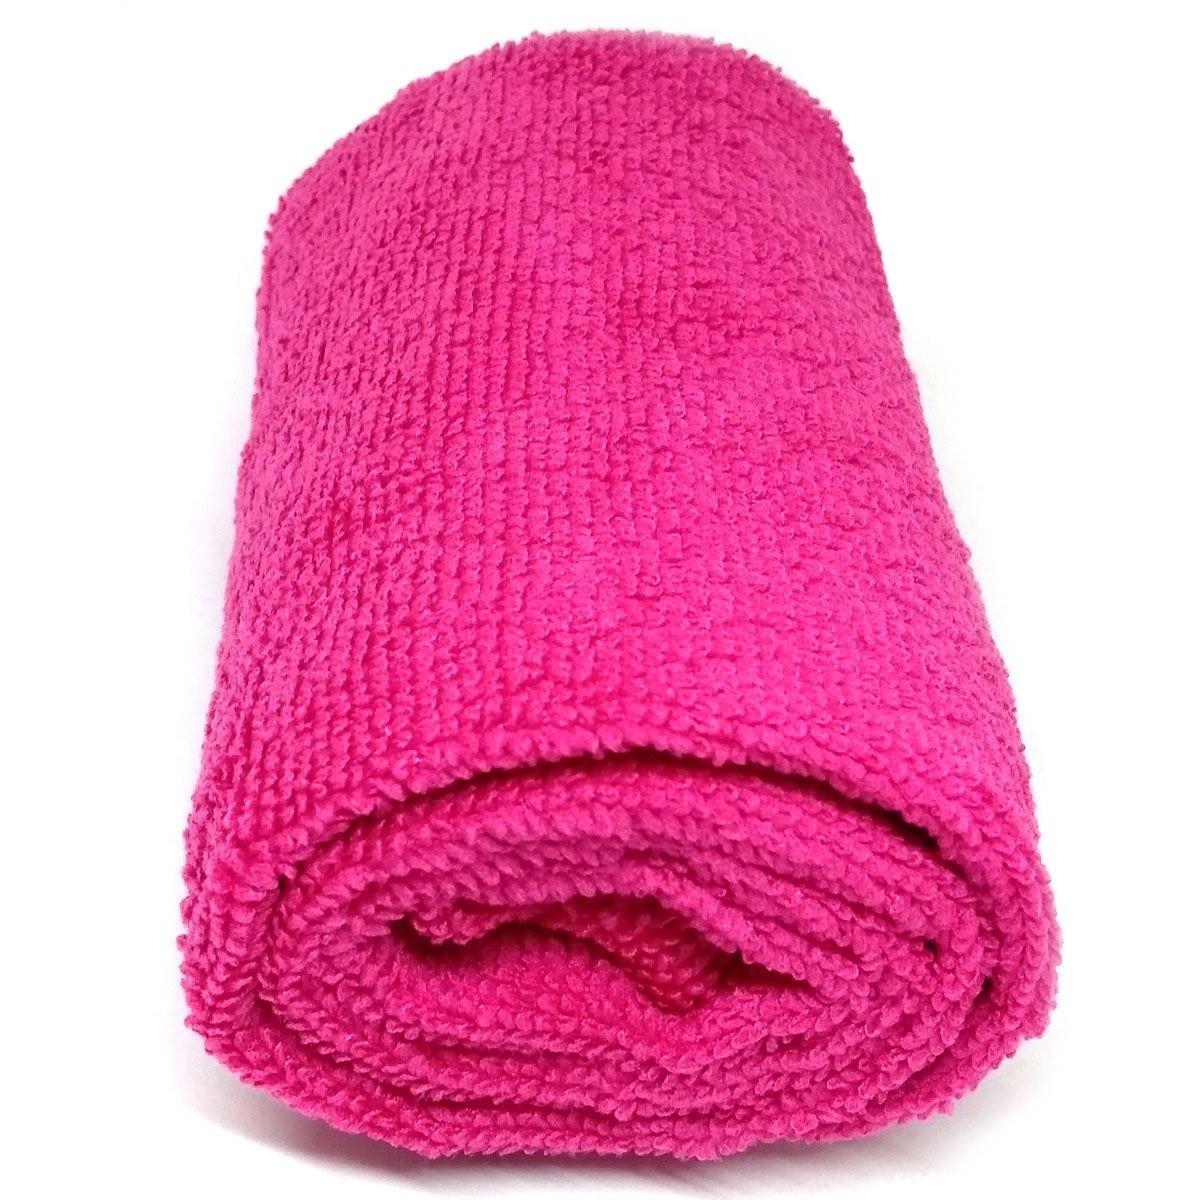 Toalha de Microfibra - Tamanho P - Pink